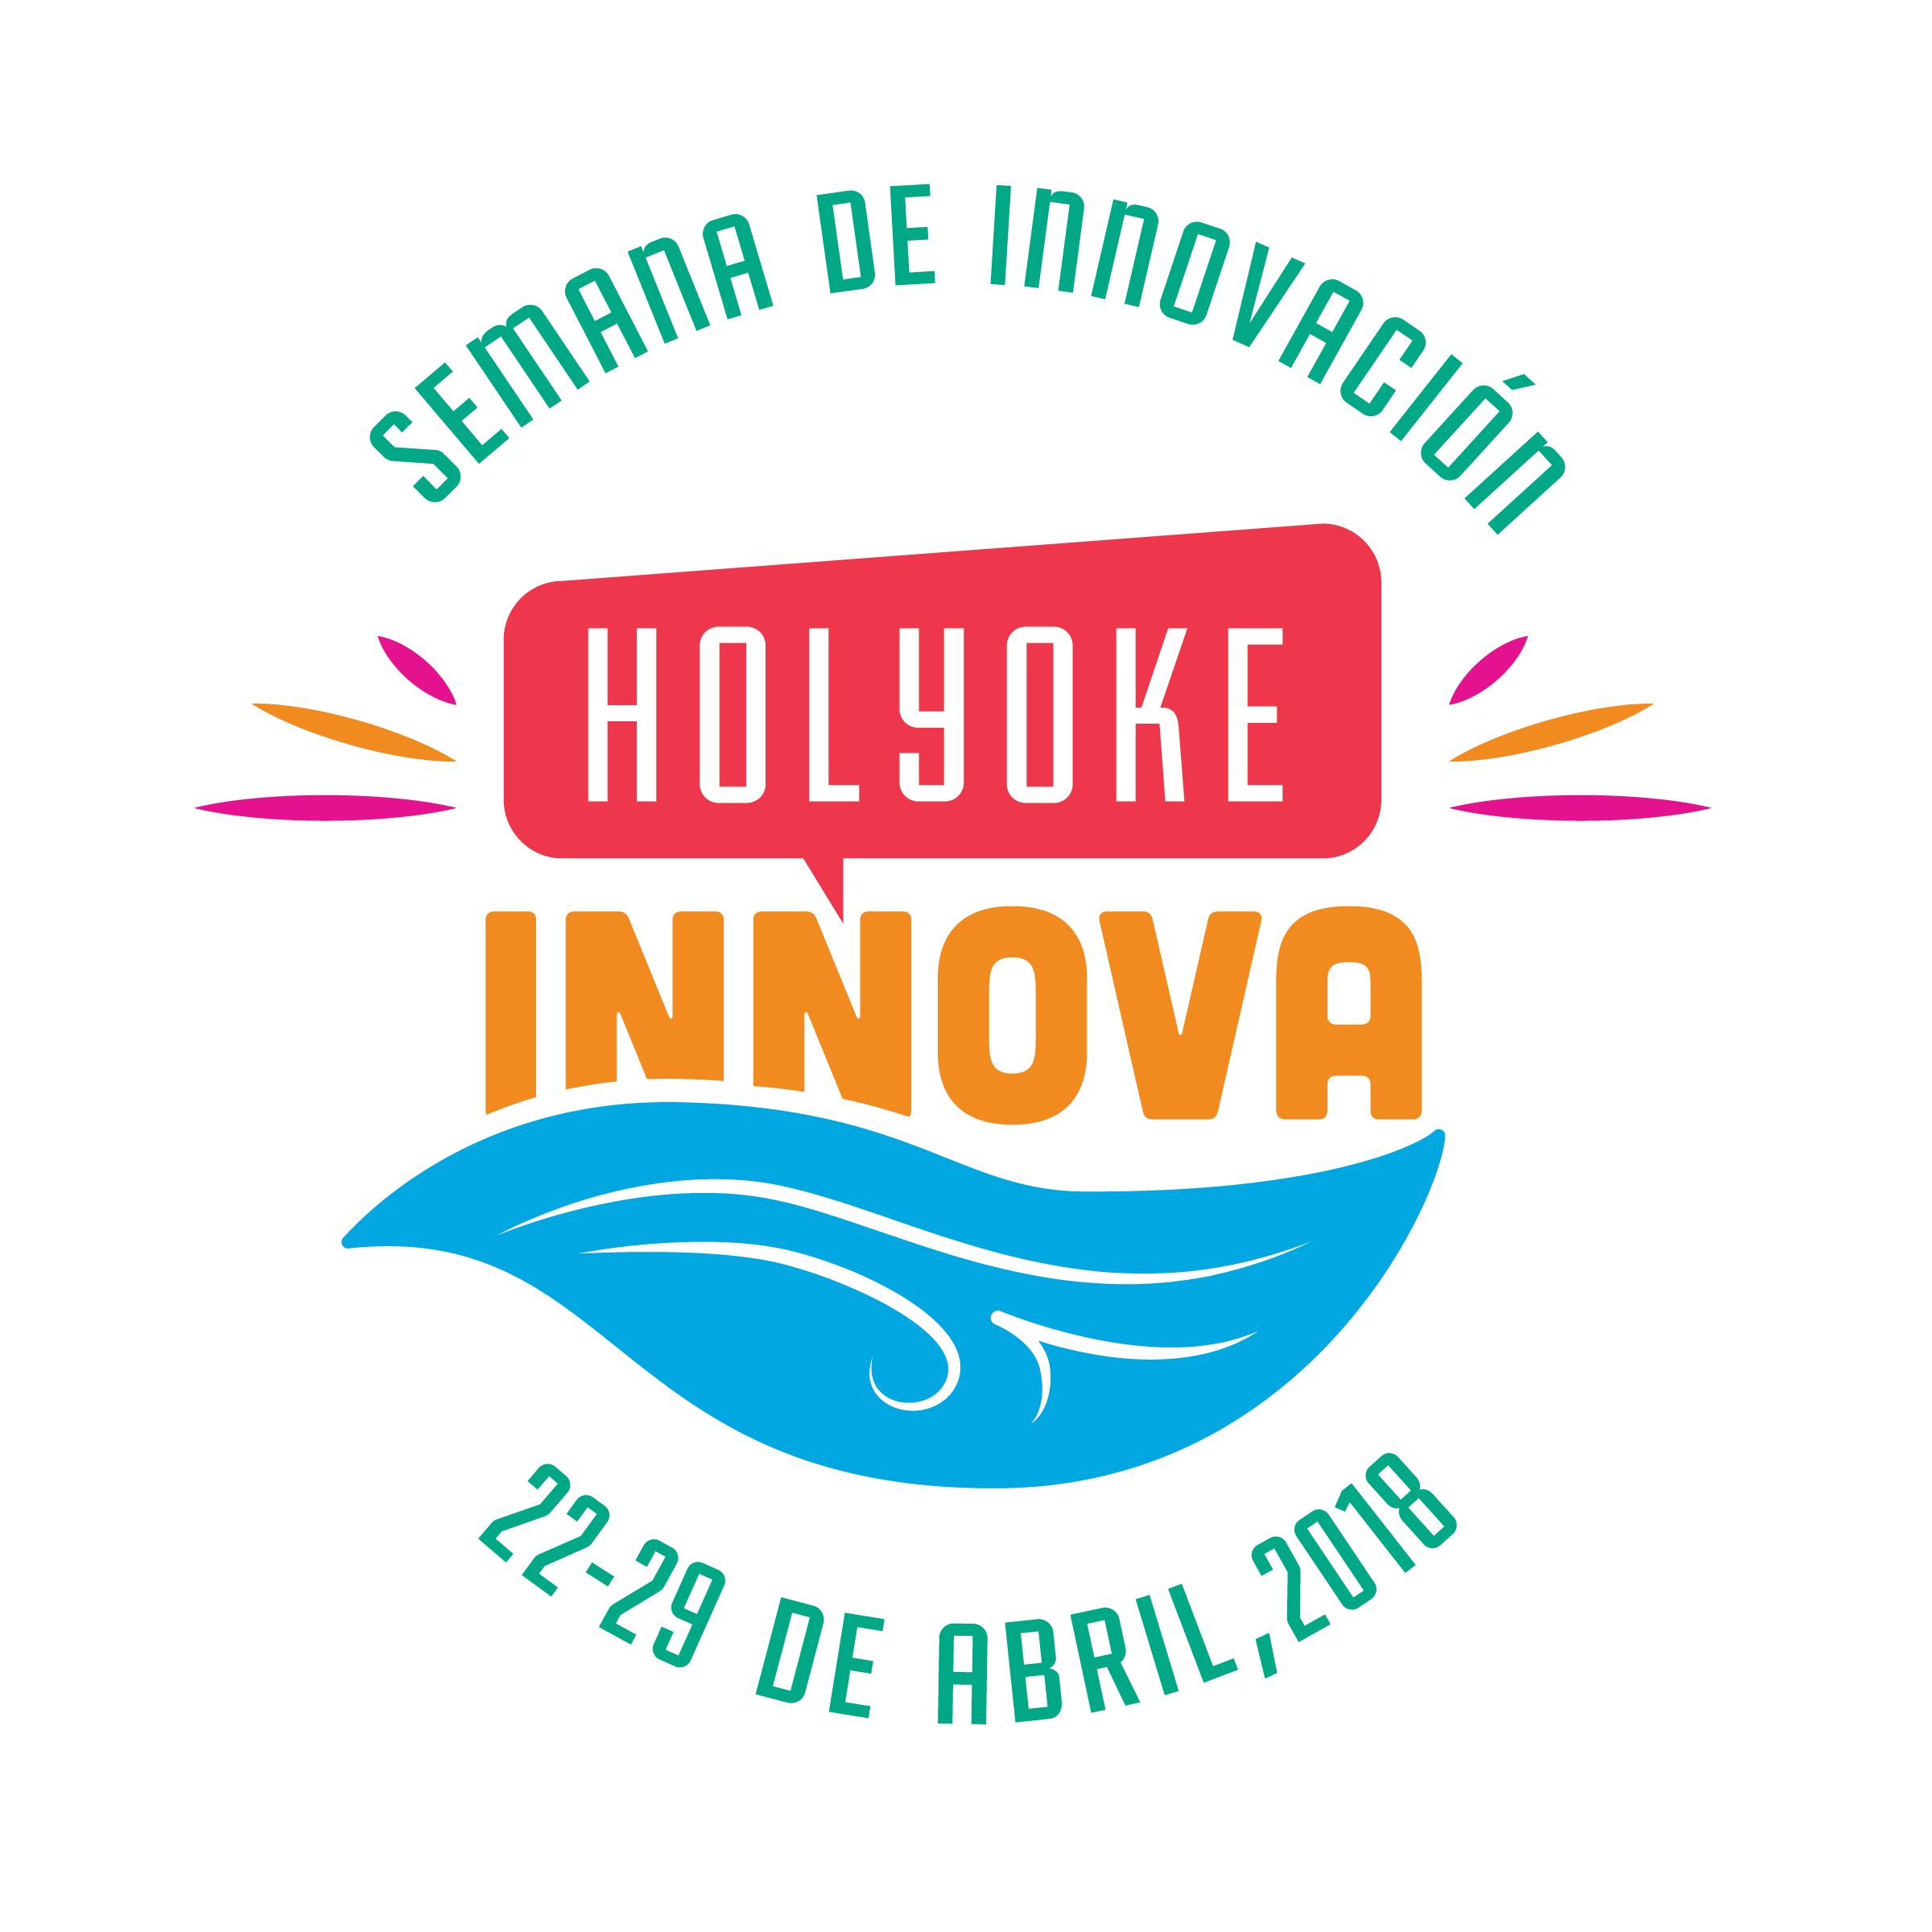 Holyoke_Innova .png